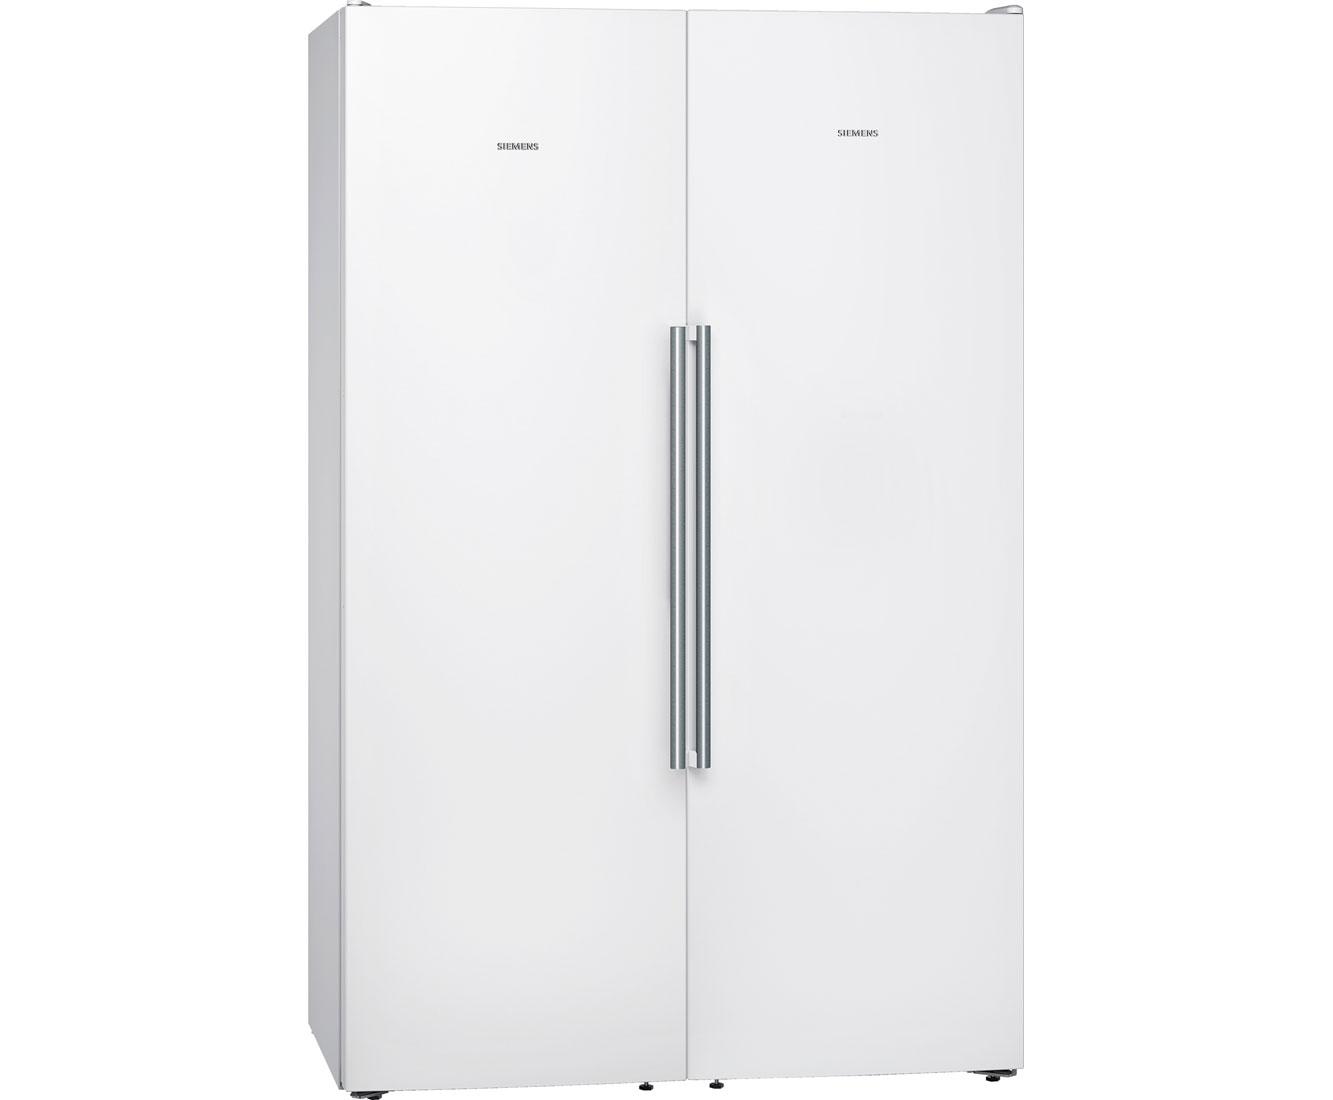 Side By Side Kühlschrank Preis Leistungssieger : Side by side kühlschrank preisvergleich u2022 die besten angebote online